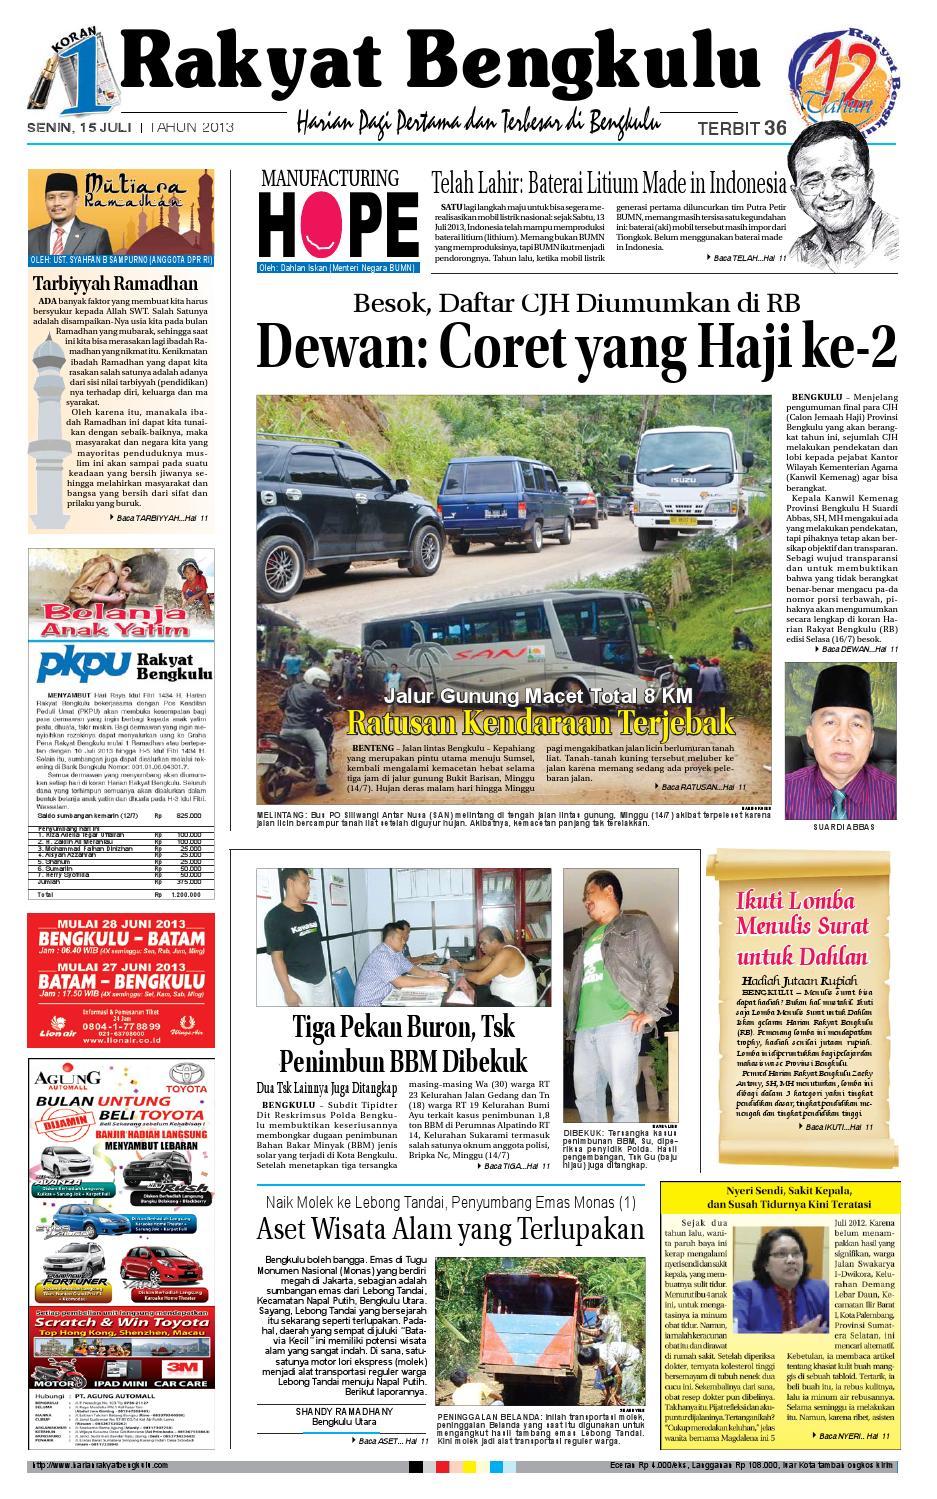 15 Juli 2013 By Rakyat Bengkulu Rb Issuu Produk Ukm Bumn Jus Durian Lite Kuning Omah Duren